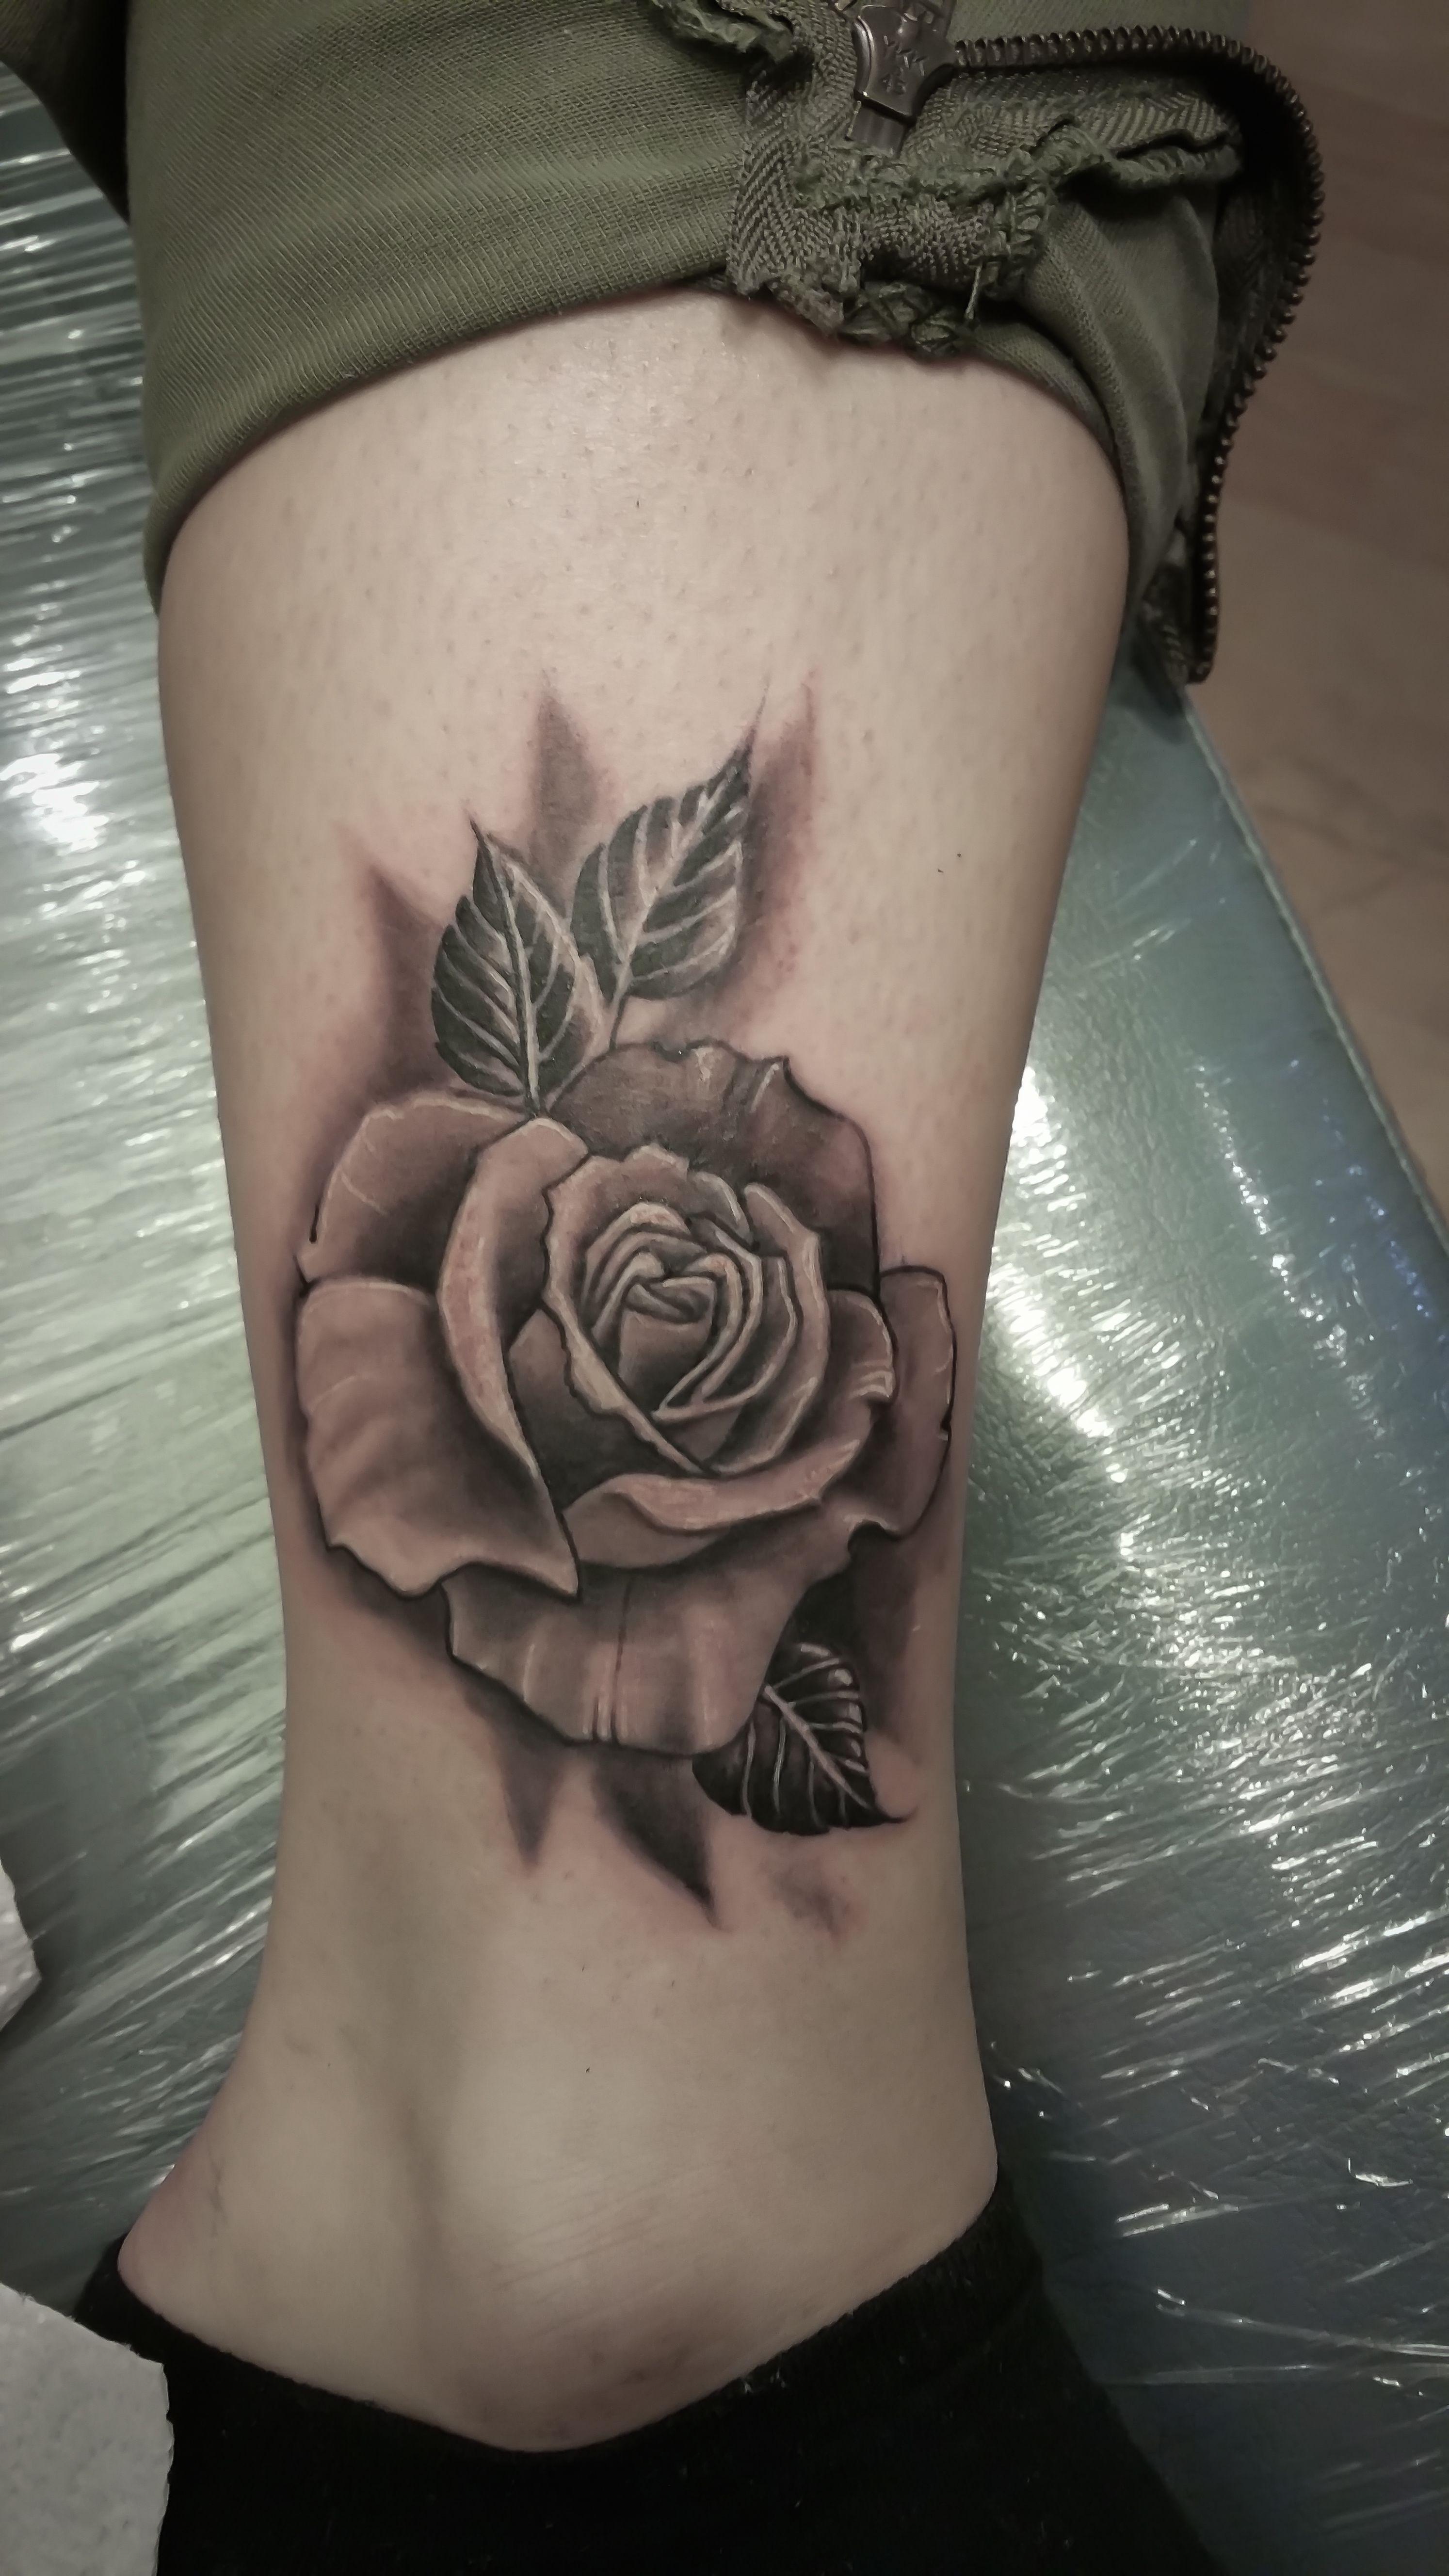 Rose Tattoo Black And White Rose Rose Drawing Tattoo Tattoos Rose Tattoo Design